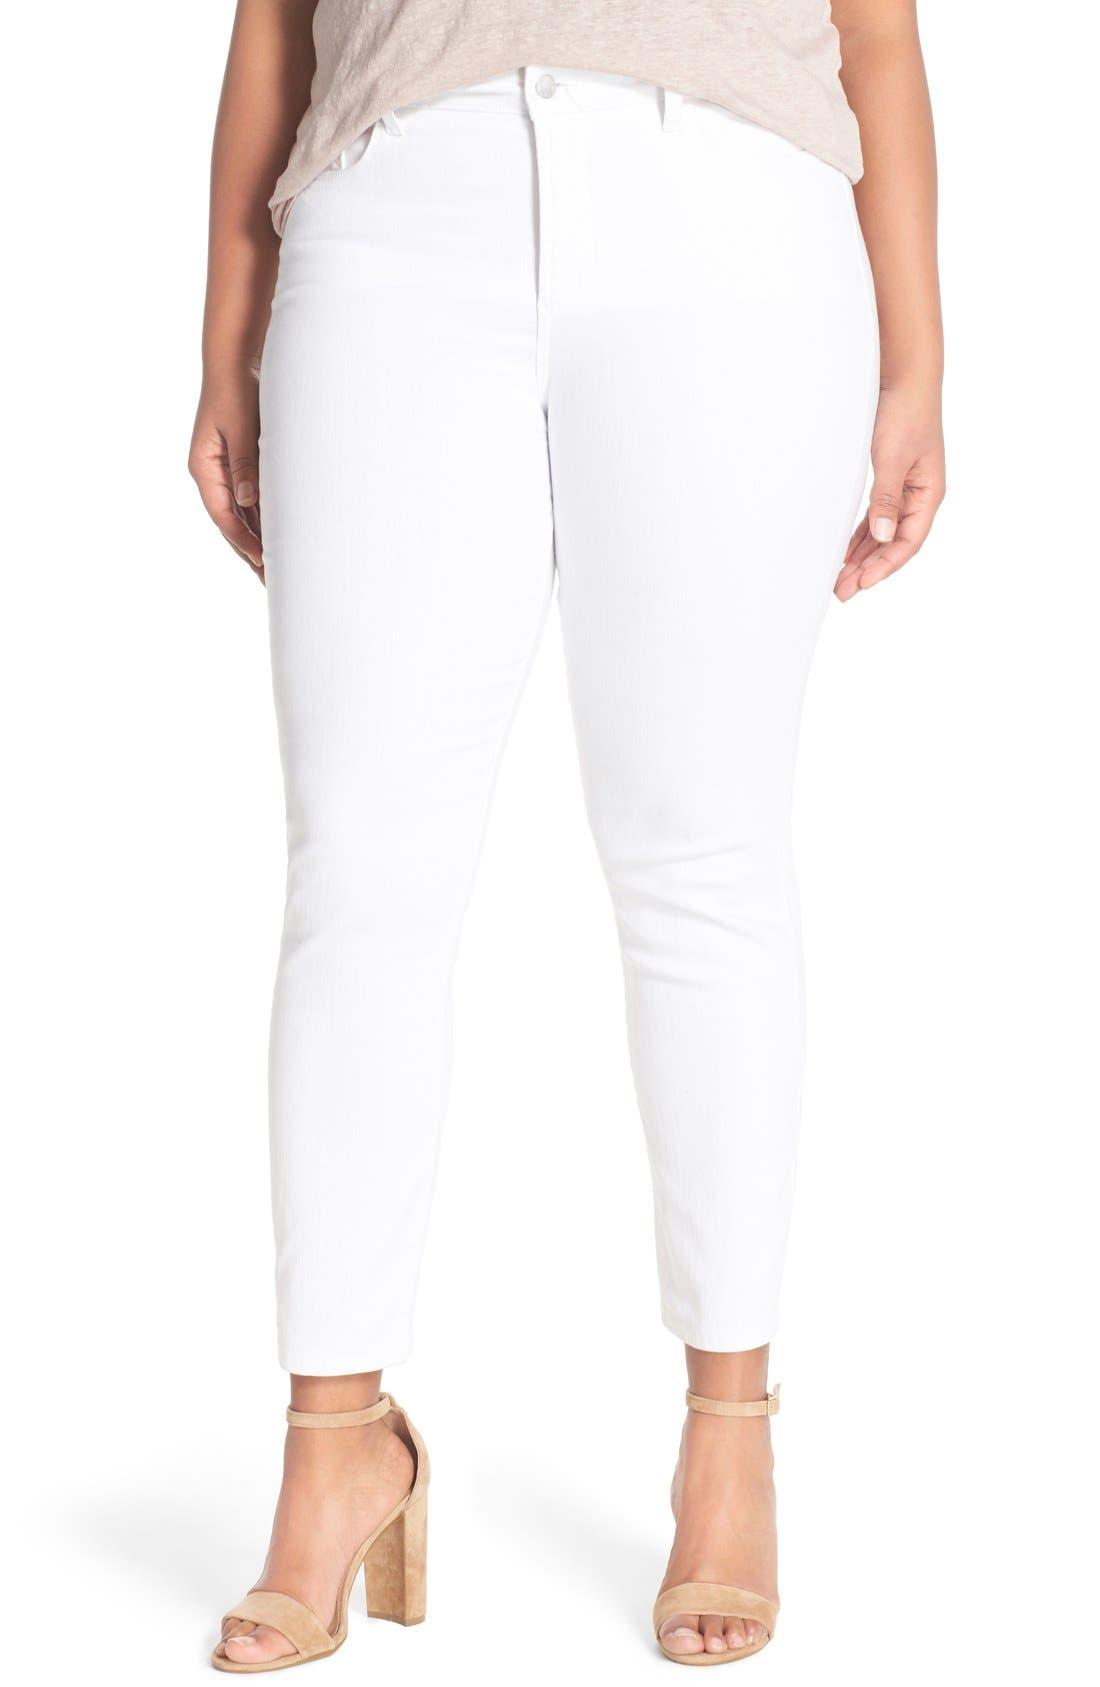 Alternate Image 1 Selected - NYDJ 'Clarissa' Stretch Slim Ankle Jeans (Plus Size)